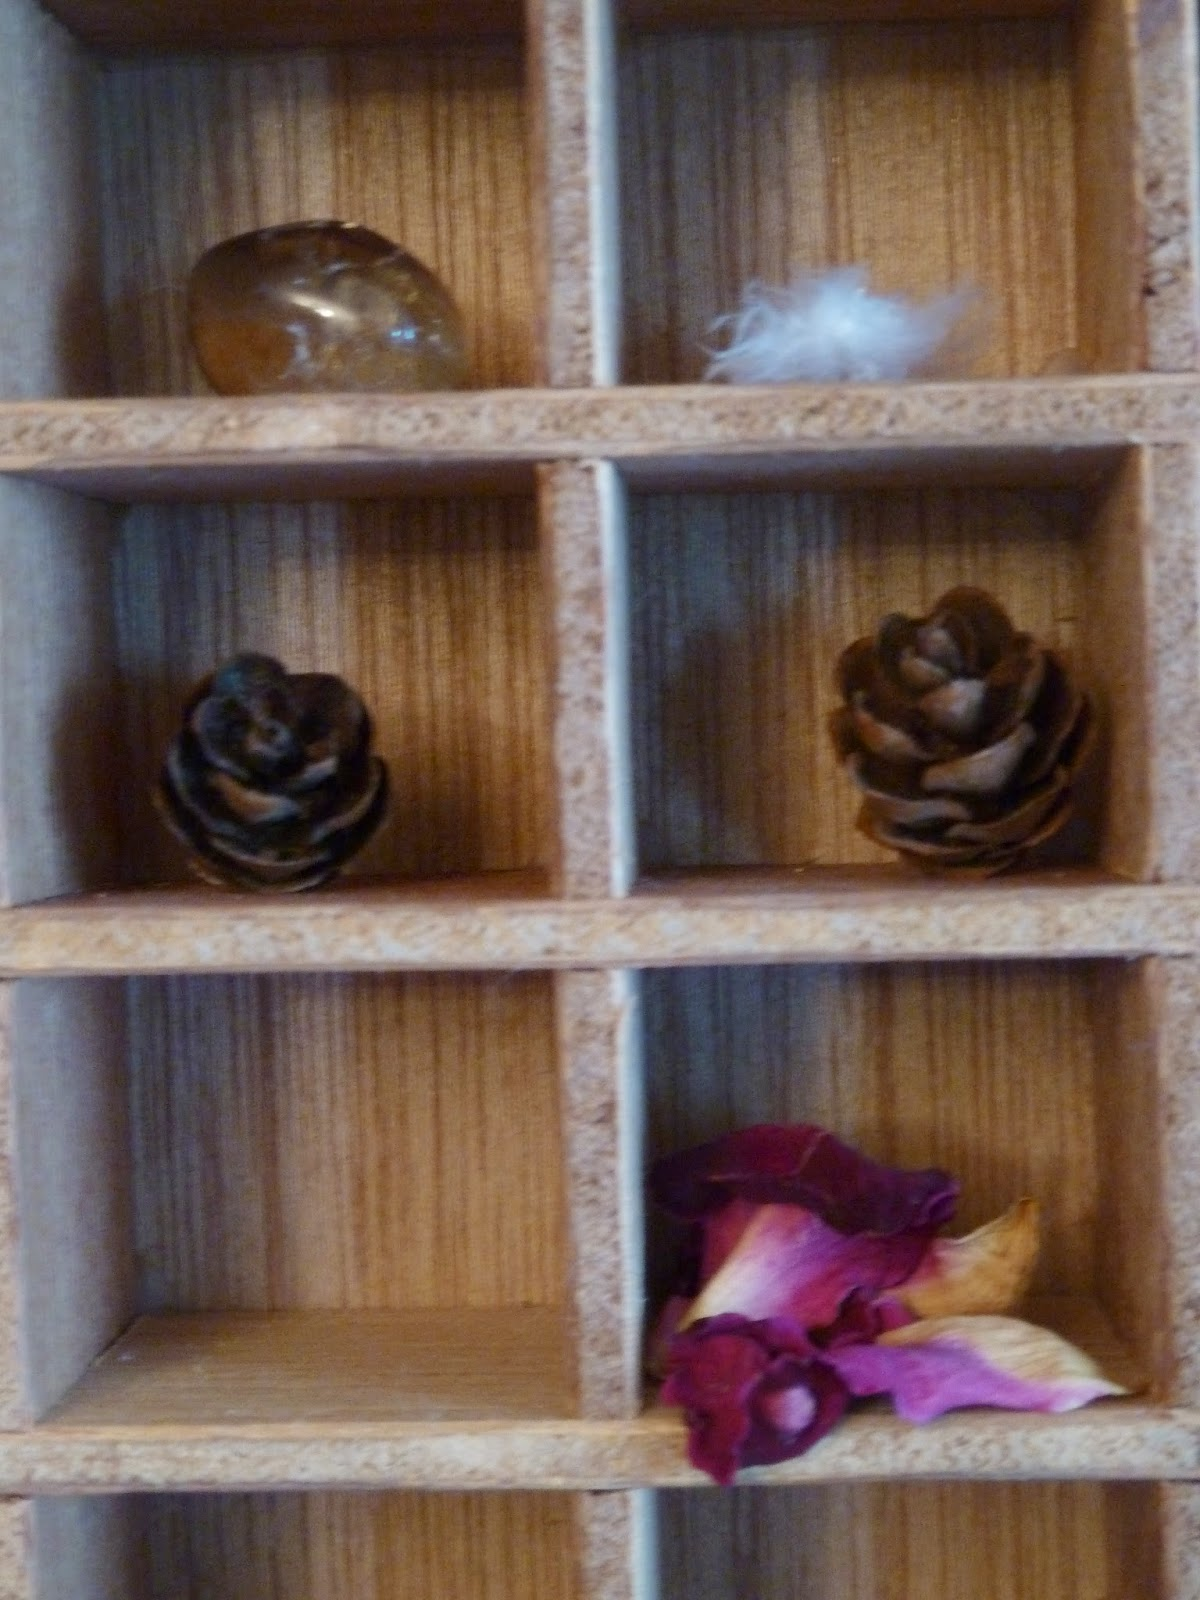 Crystal, feather, pine cones and petals in my treasury